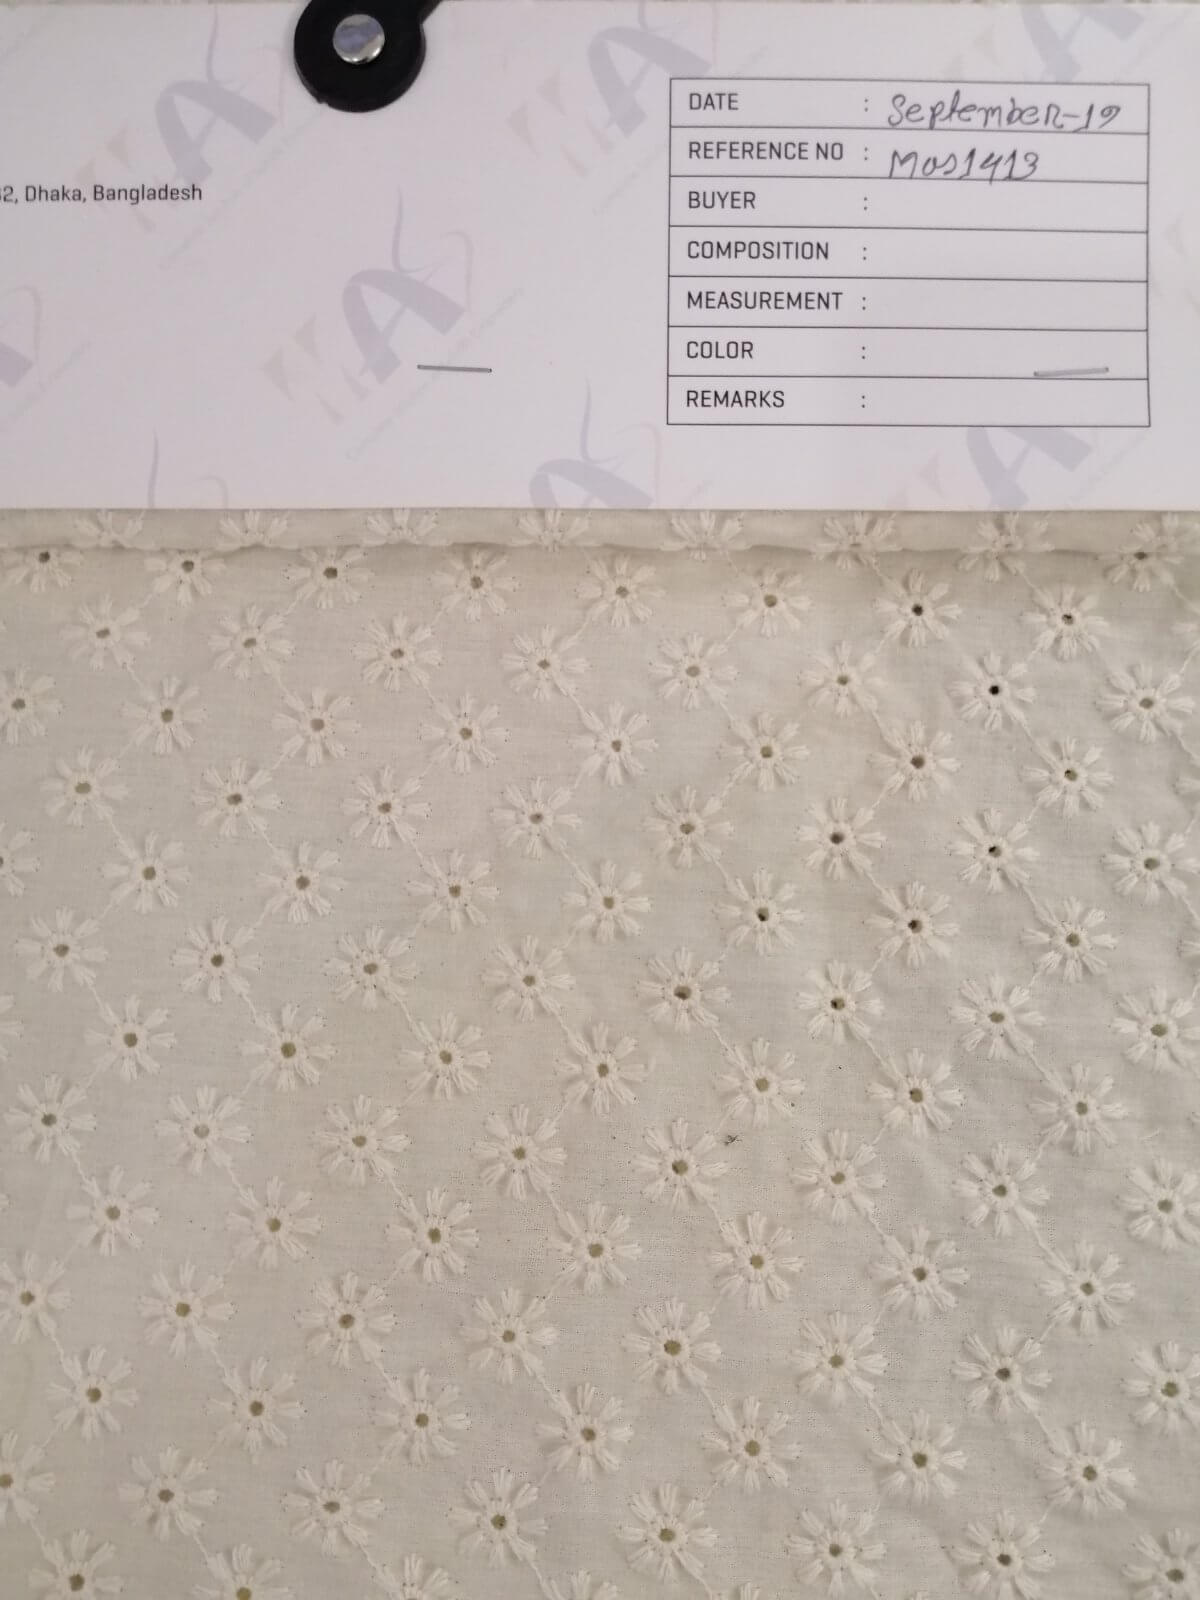 Mas Lace and Fabrics Ltd